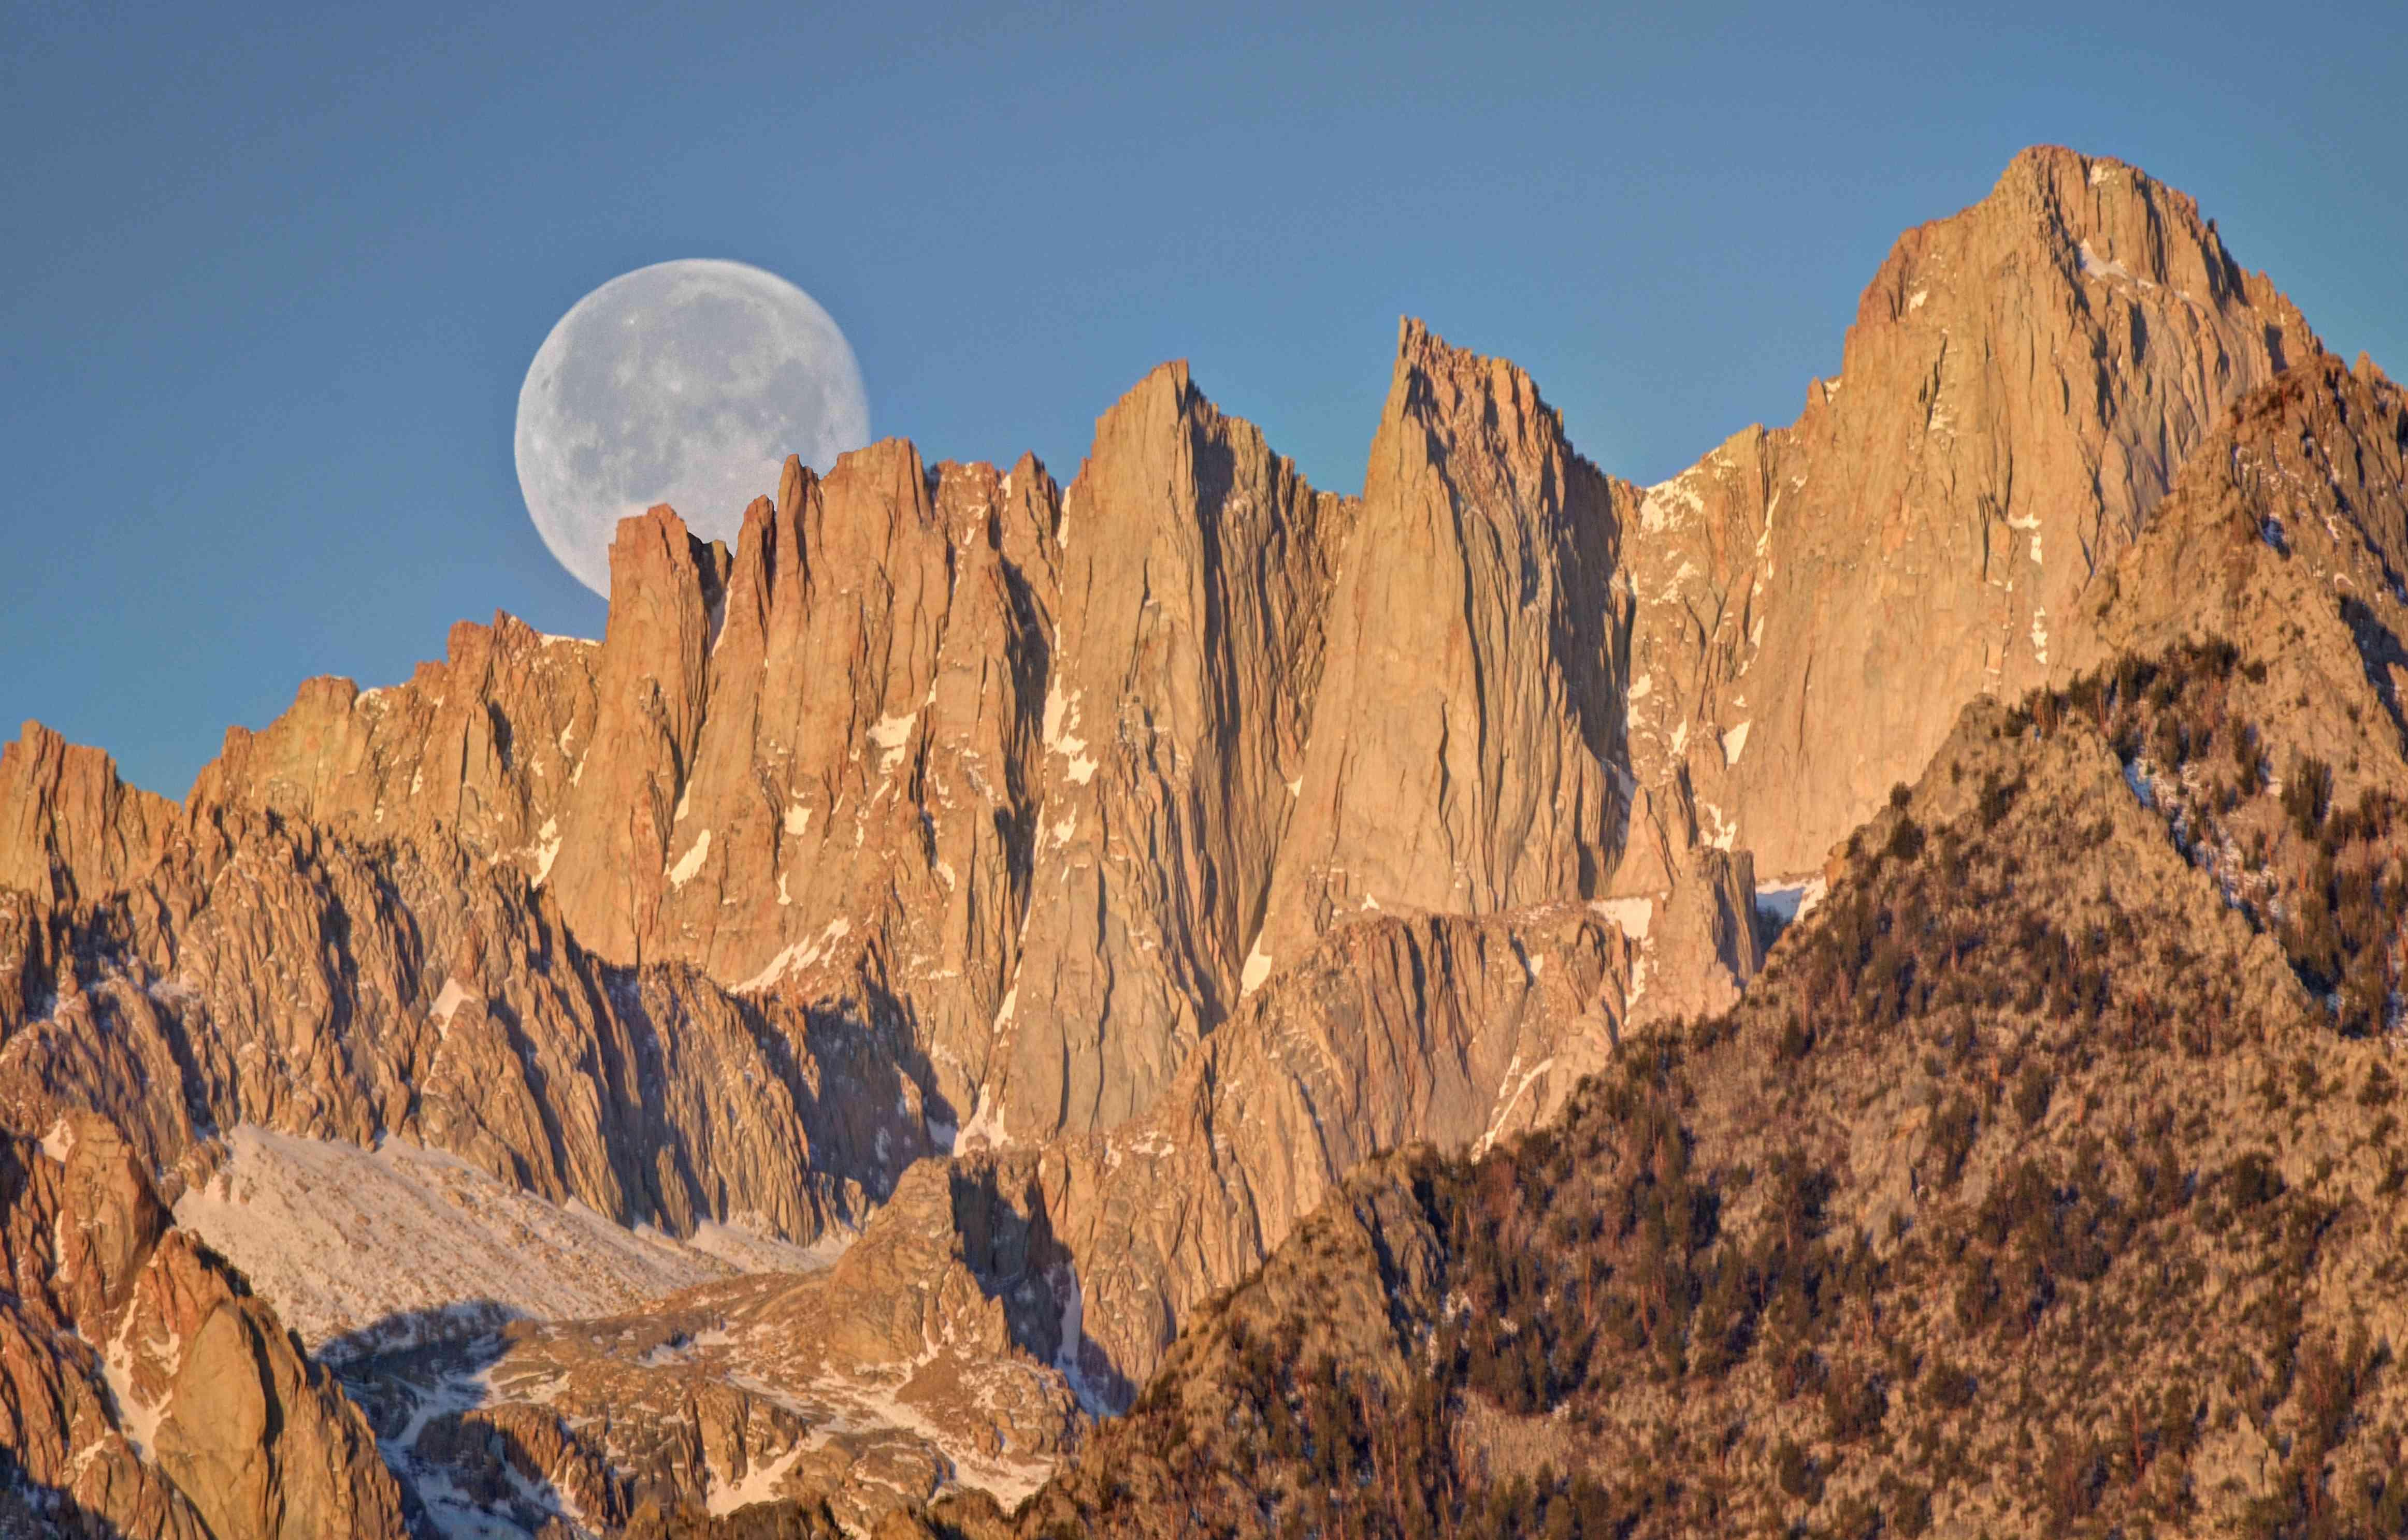 Moon setting Over mount whitney, California, America, USA